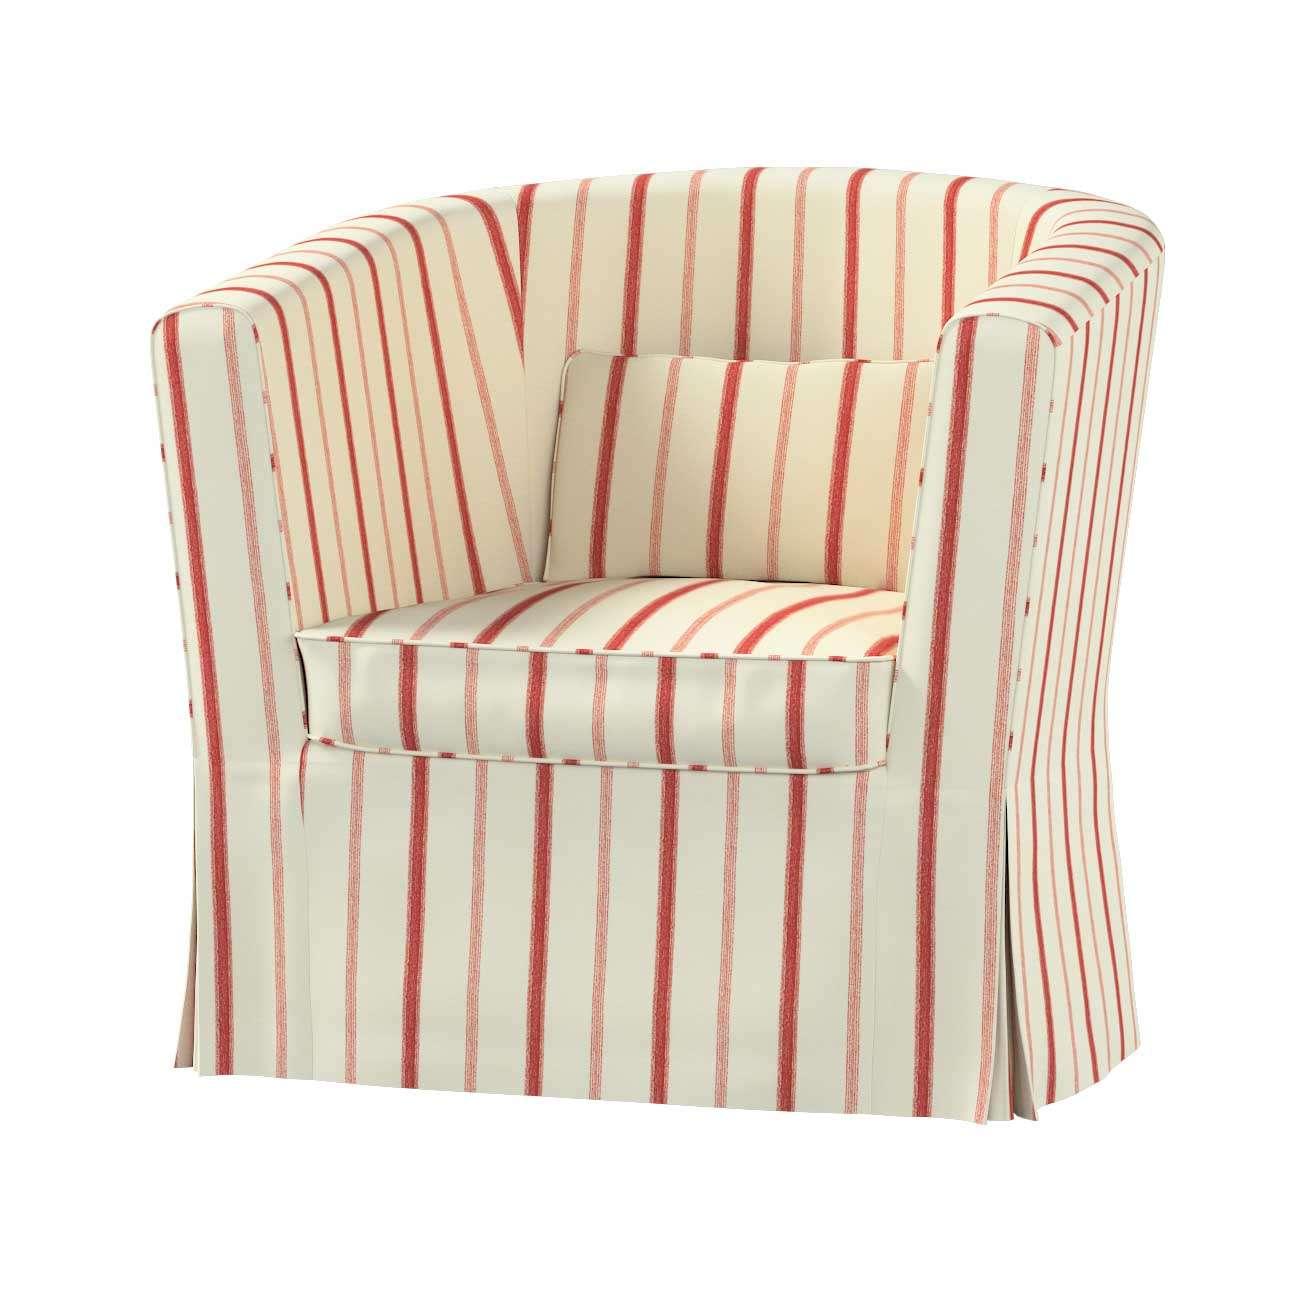 Pokrowiec na fotel Ektorp Tullsta fotel Ektorp Tullsta w kolekcji Avinon, tkanina: 129-15